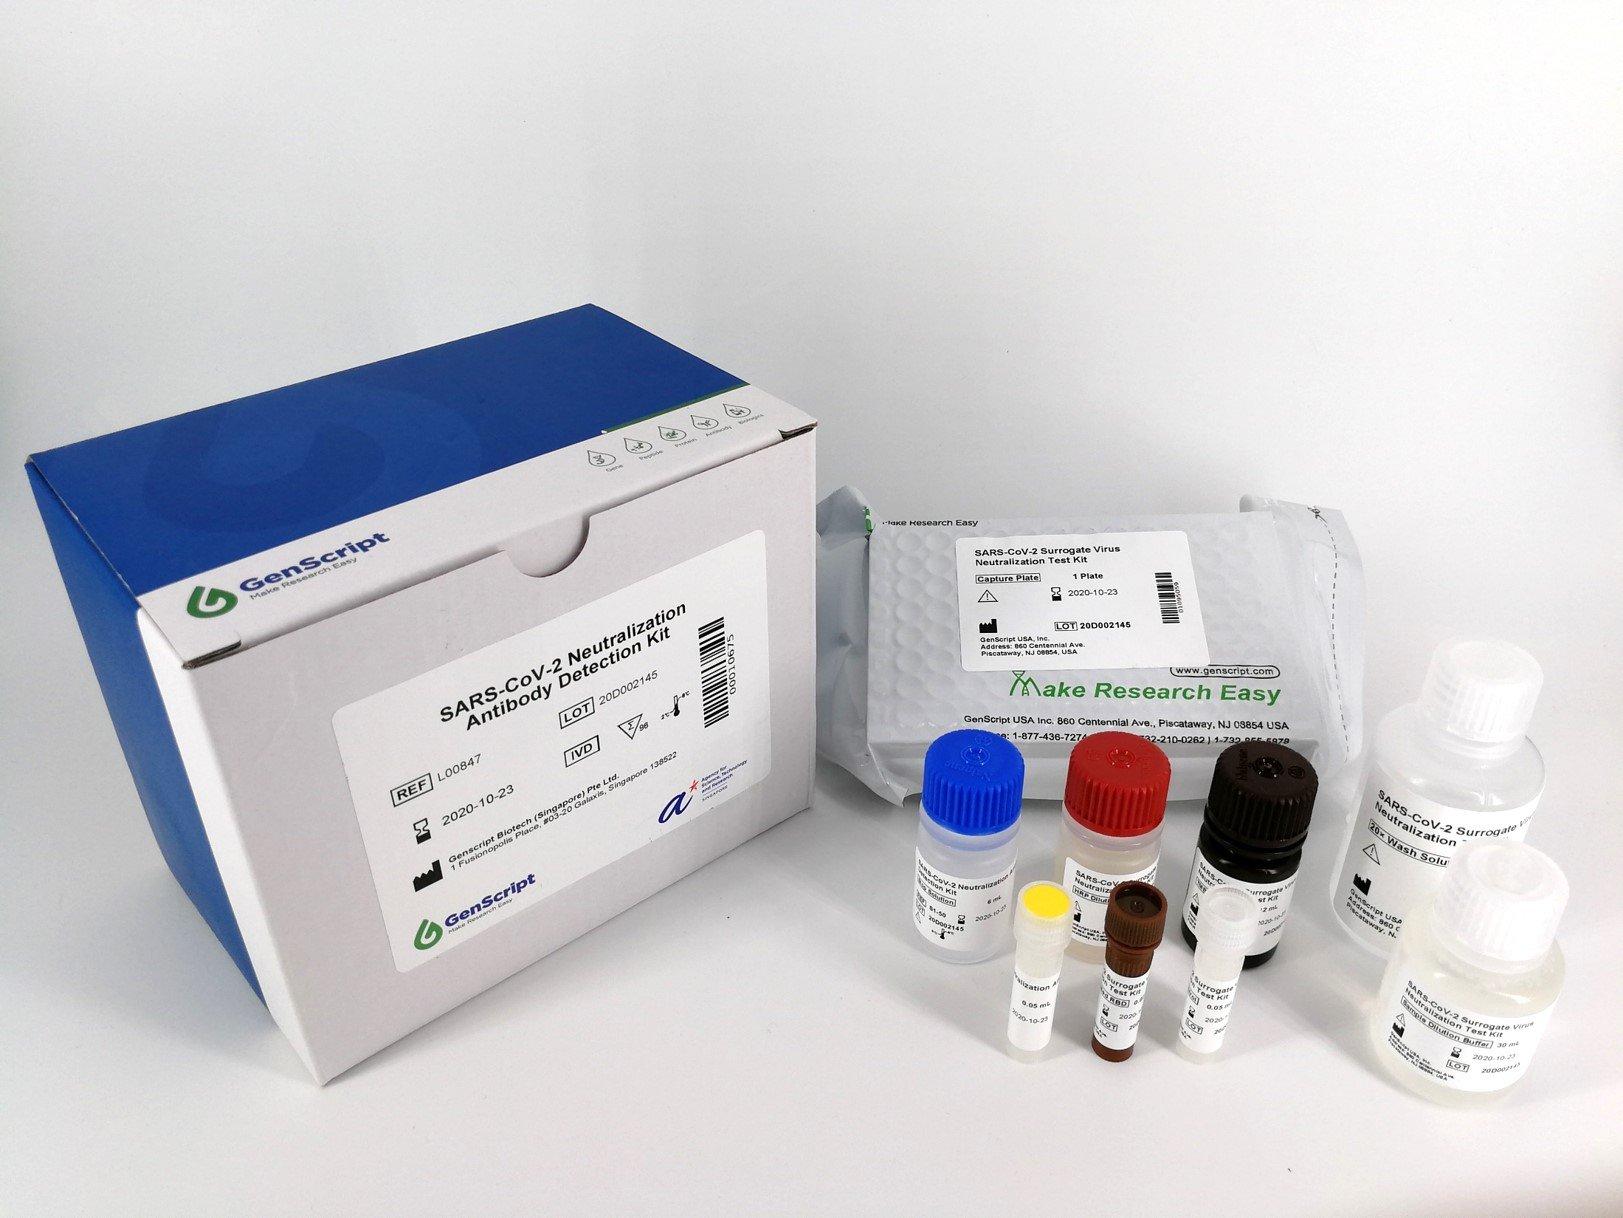 Duke-NUS Covid Test Kit